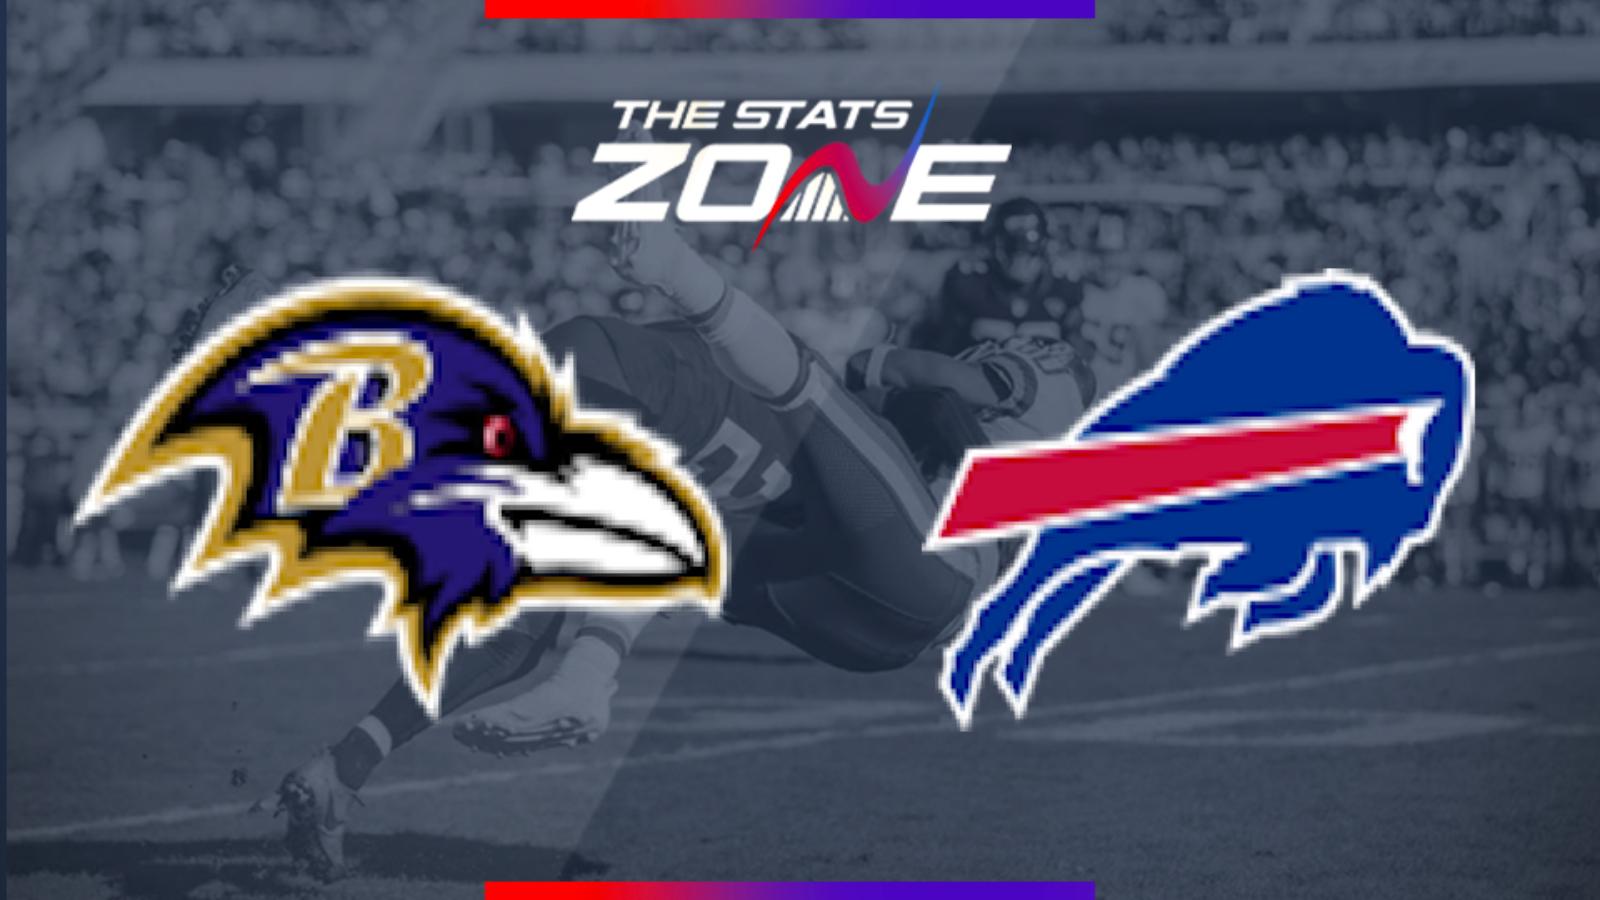 2019 Nfl Baltimore Ravens Buffalo Bills Preview Pick The Stats Zone